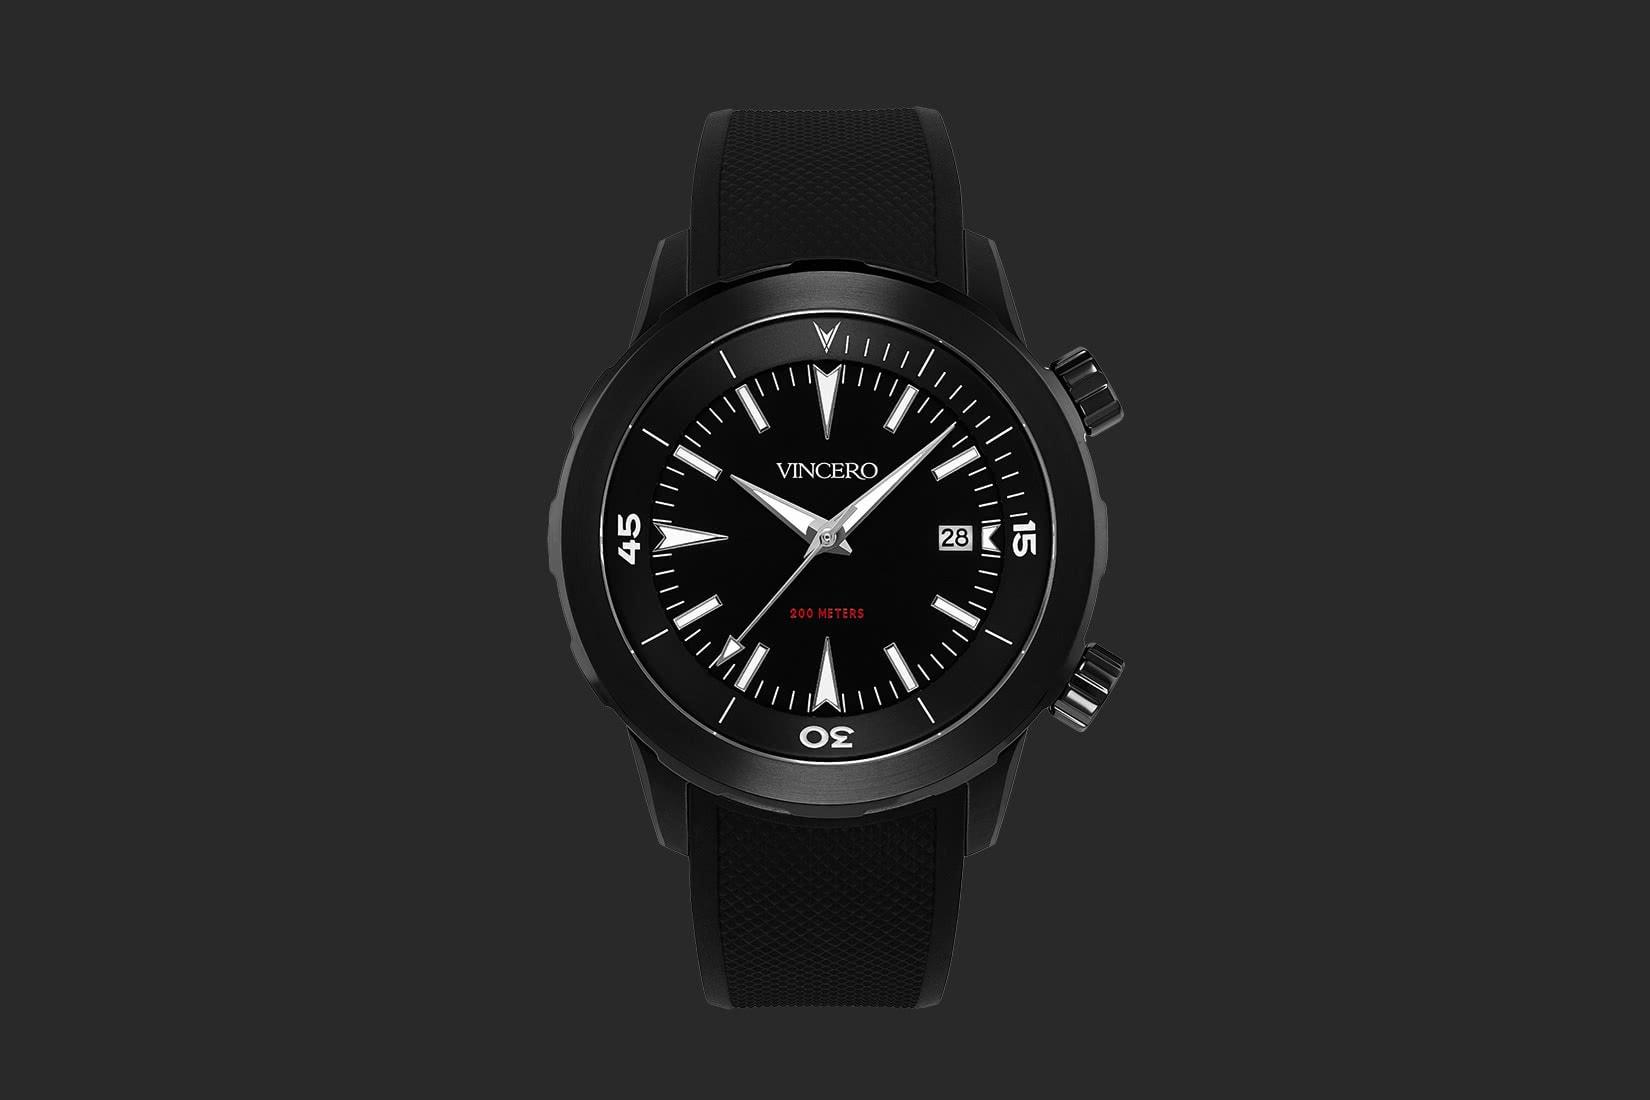 best dive watch affordable vincero vessel review - Luxe Digital